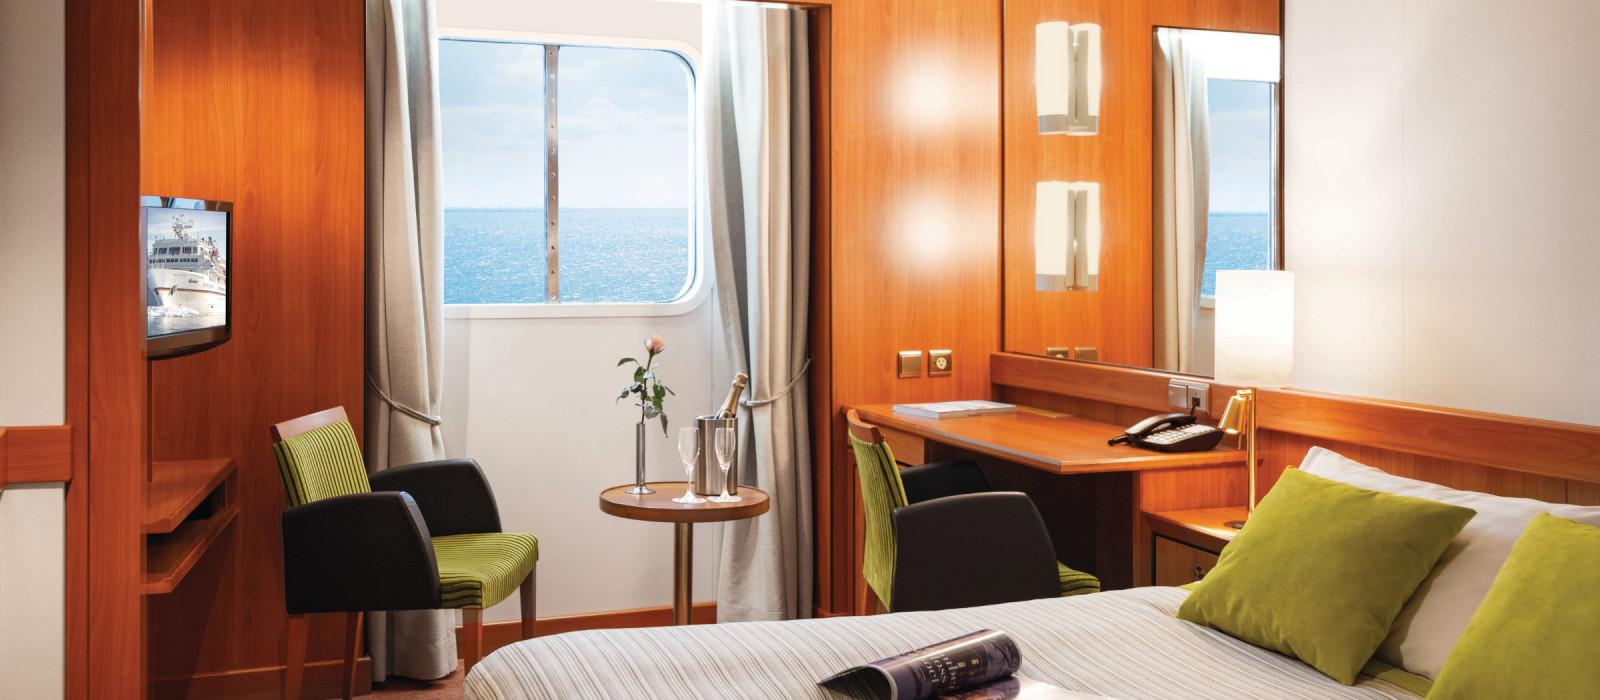 Hotel Seaventure by Polar Latitudes Antarktis